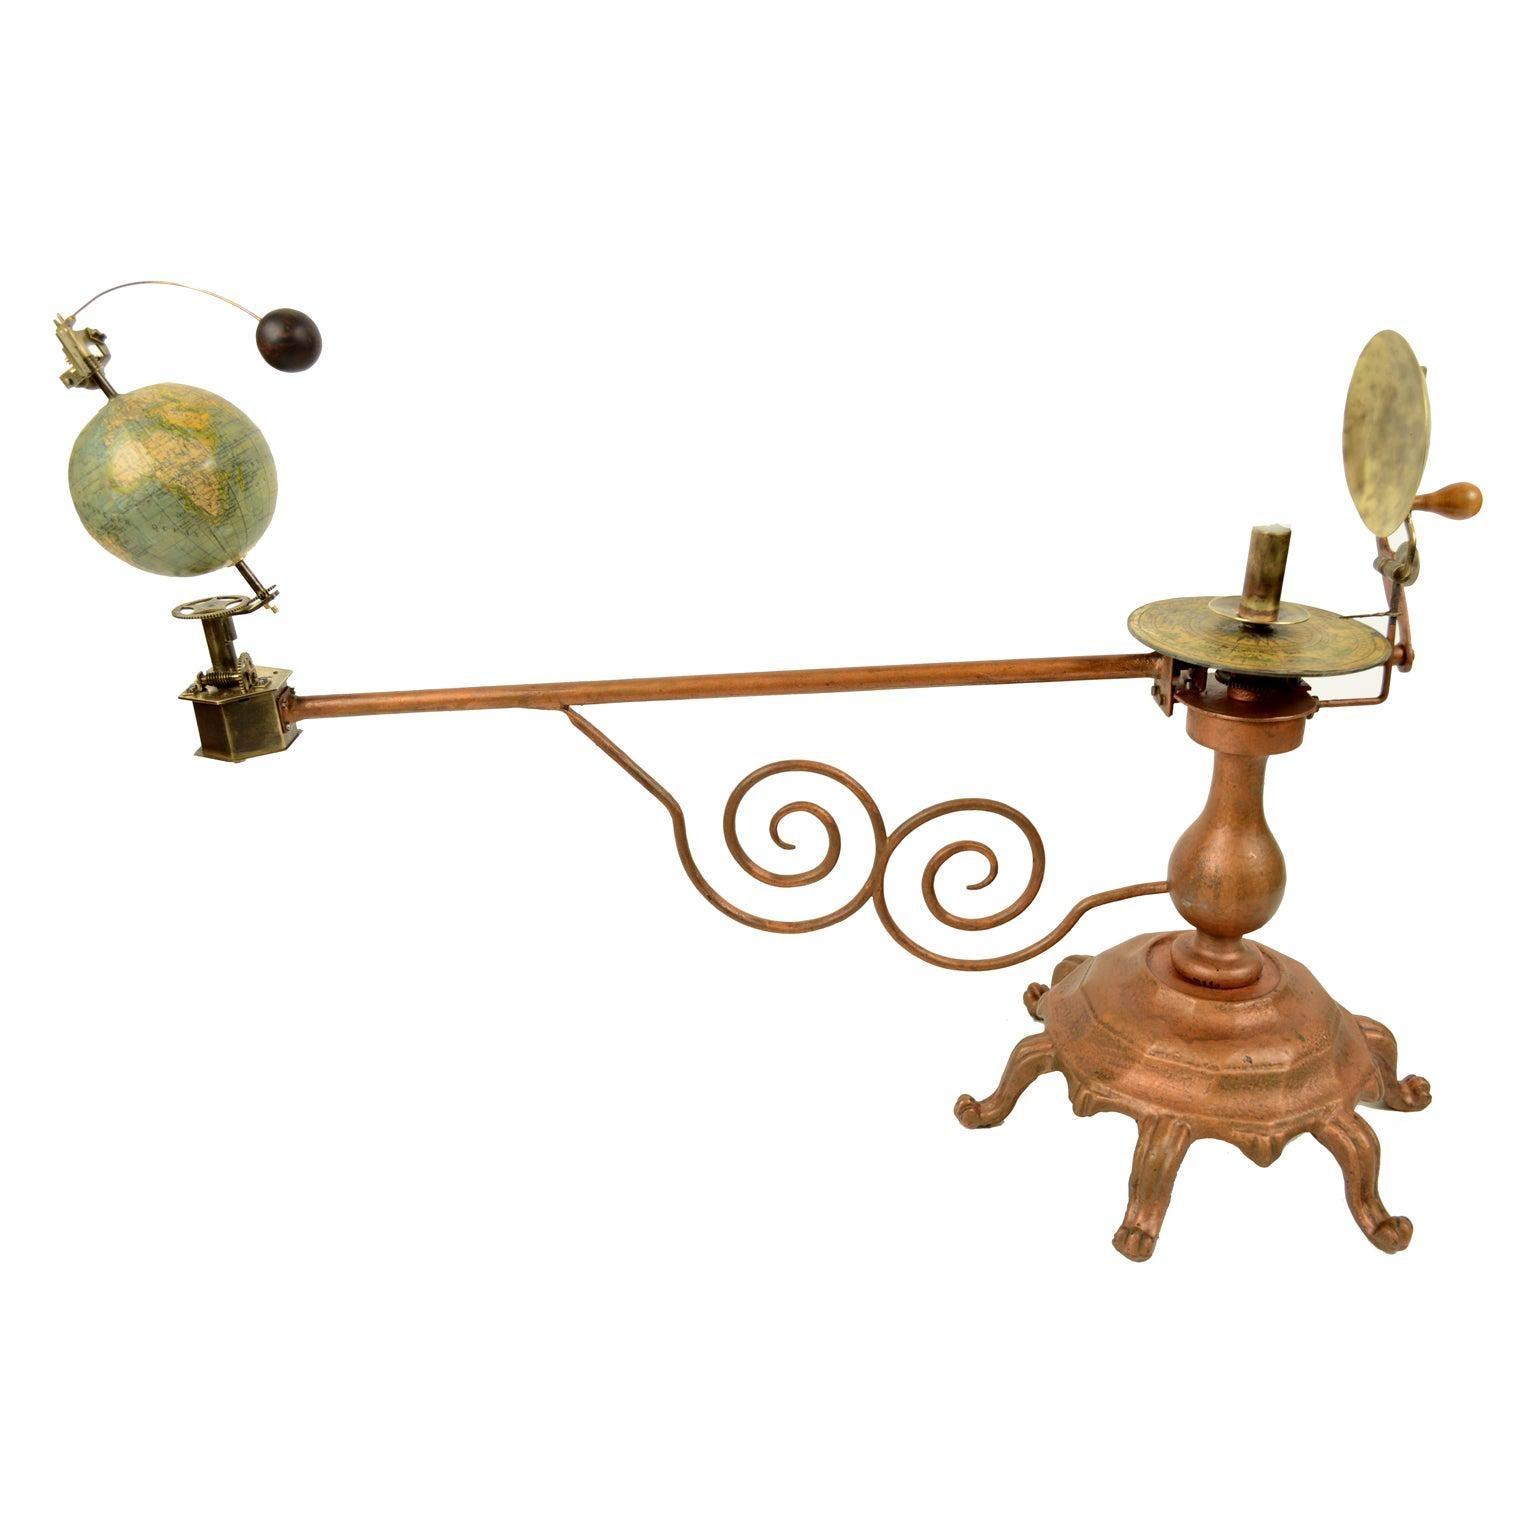 Antique Brass Czech Orrery Astronomical Instruments Made by Jan Felkl in 1870